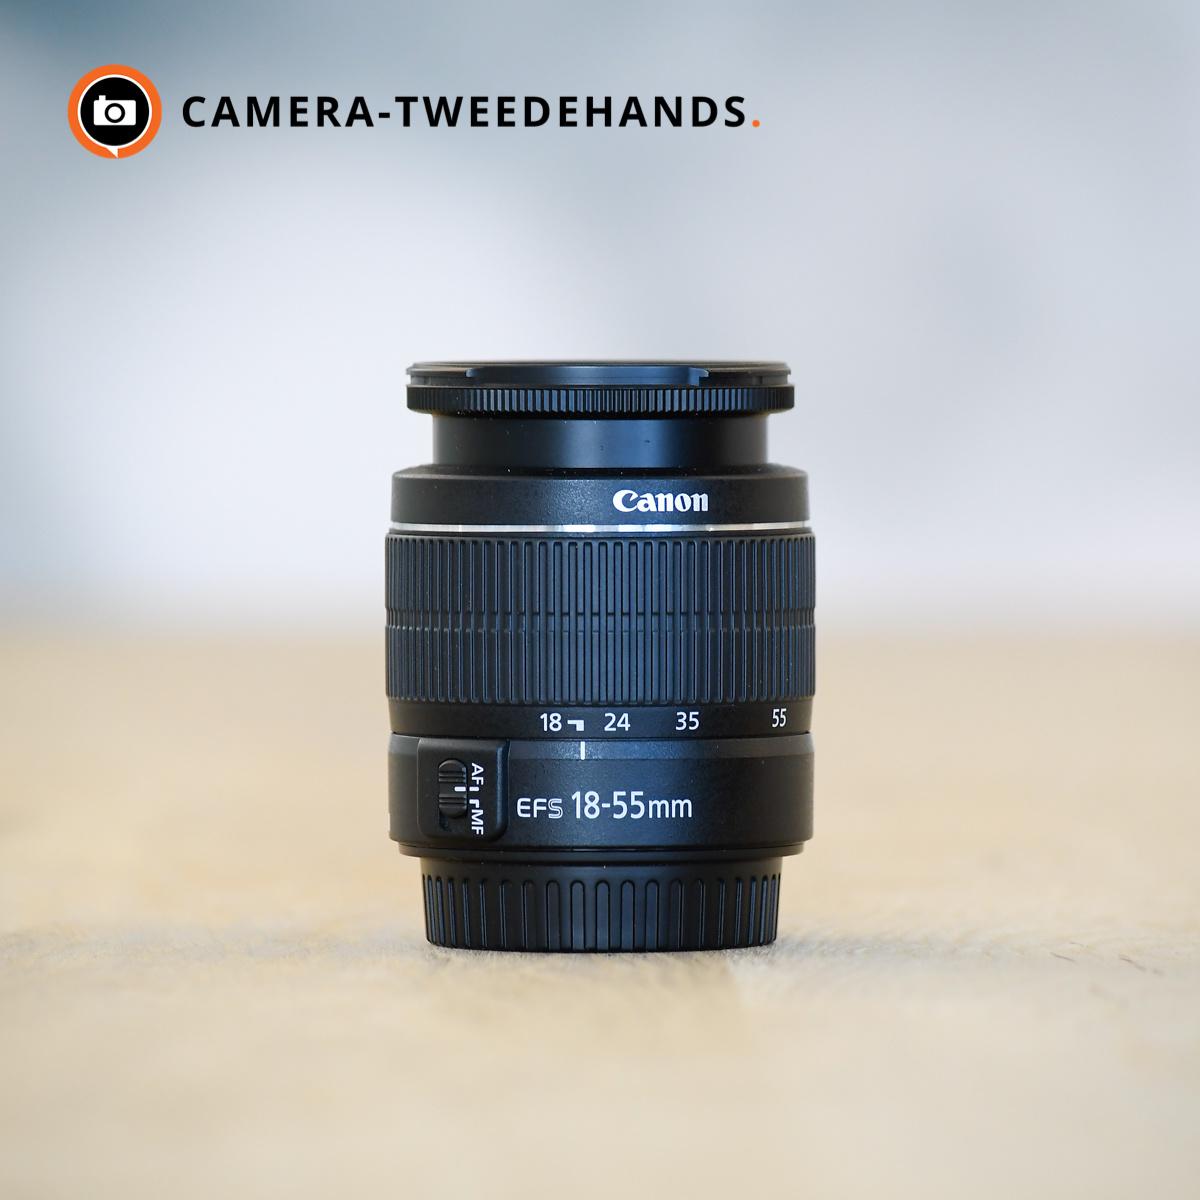 Canon Canon 18-55mm 3.5-5.6 III